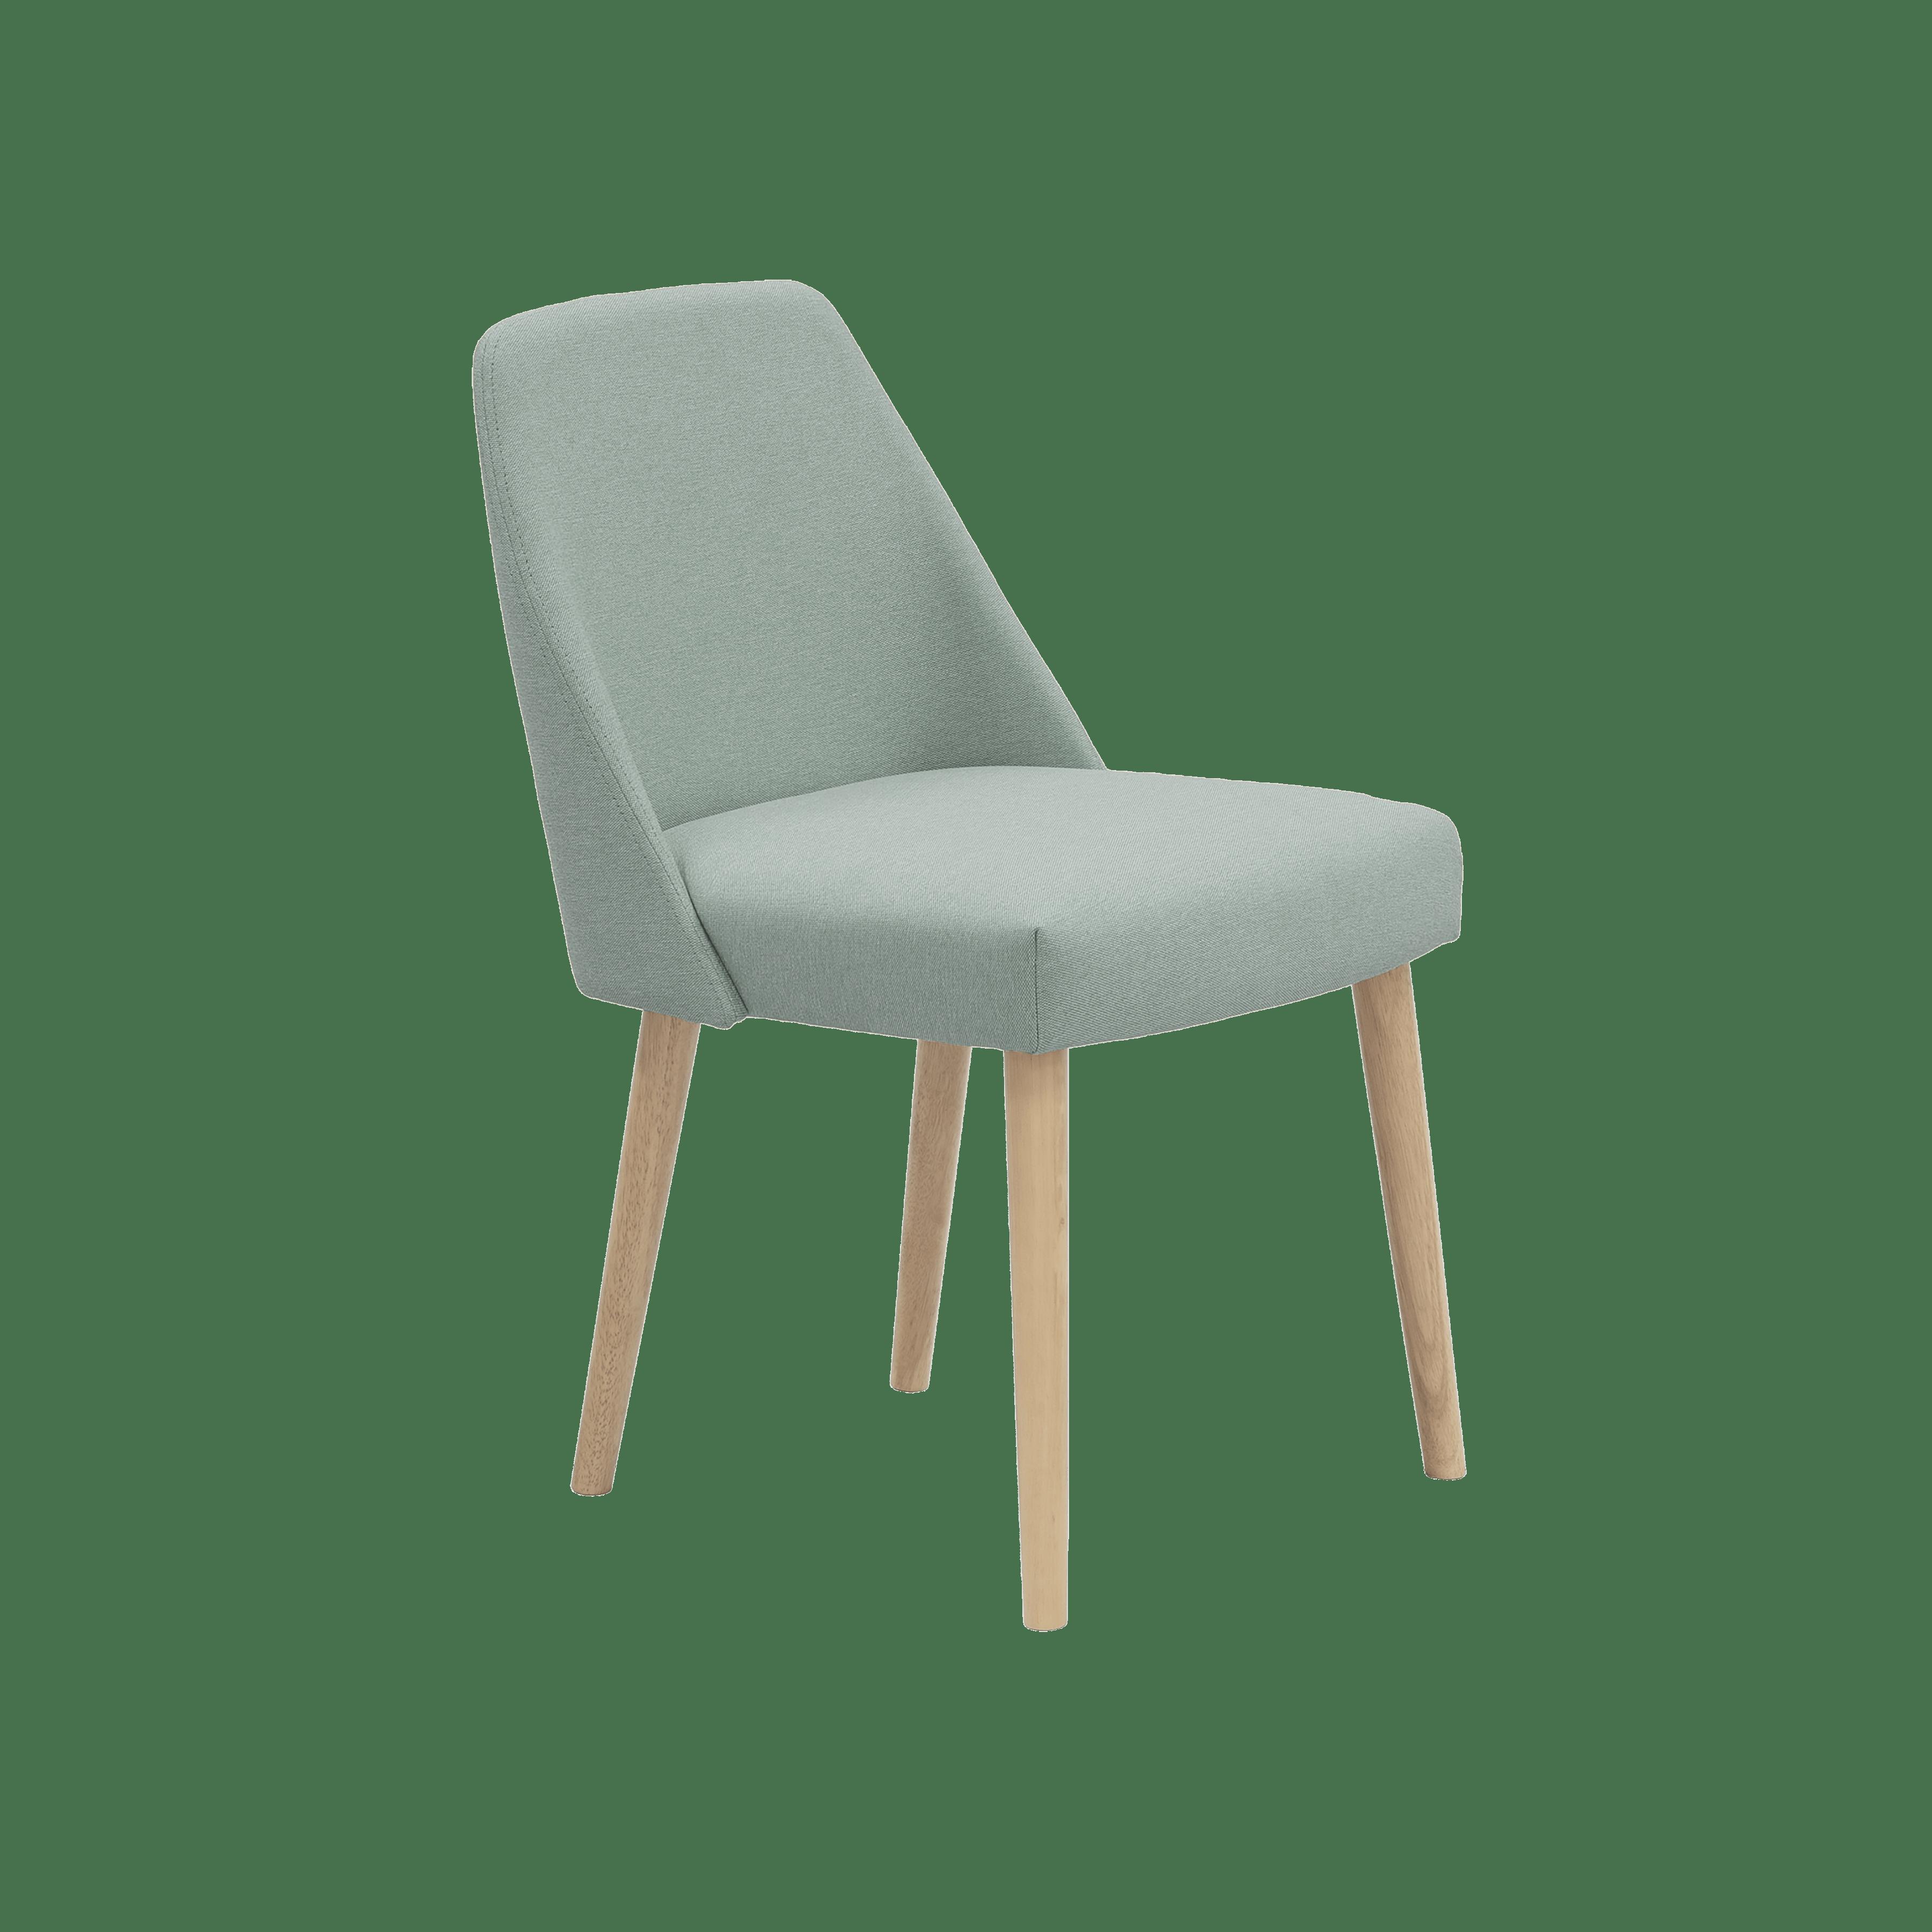 Miranda_Dining_Chair-SeaGreen-Angle.png?w=300;fm=jpg;q=80?fm=jpg;q=85;w=300